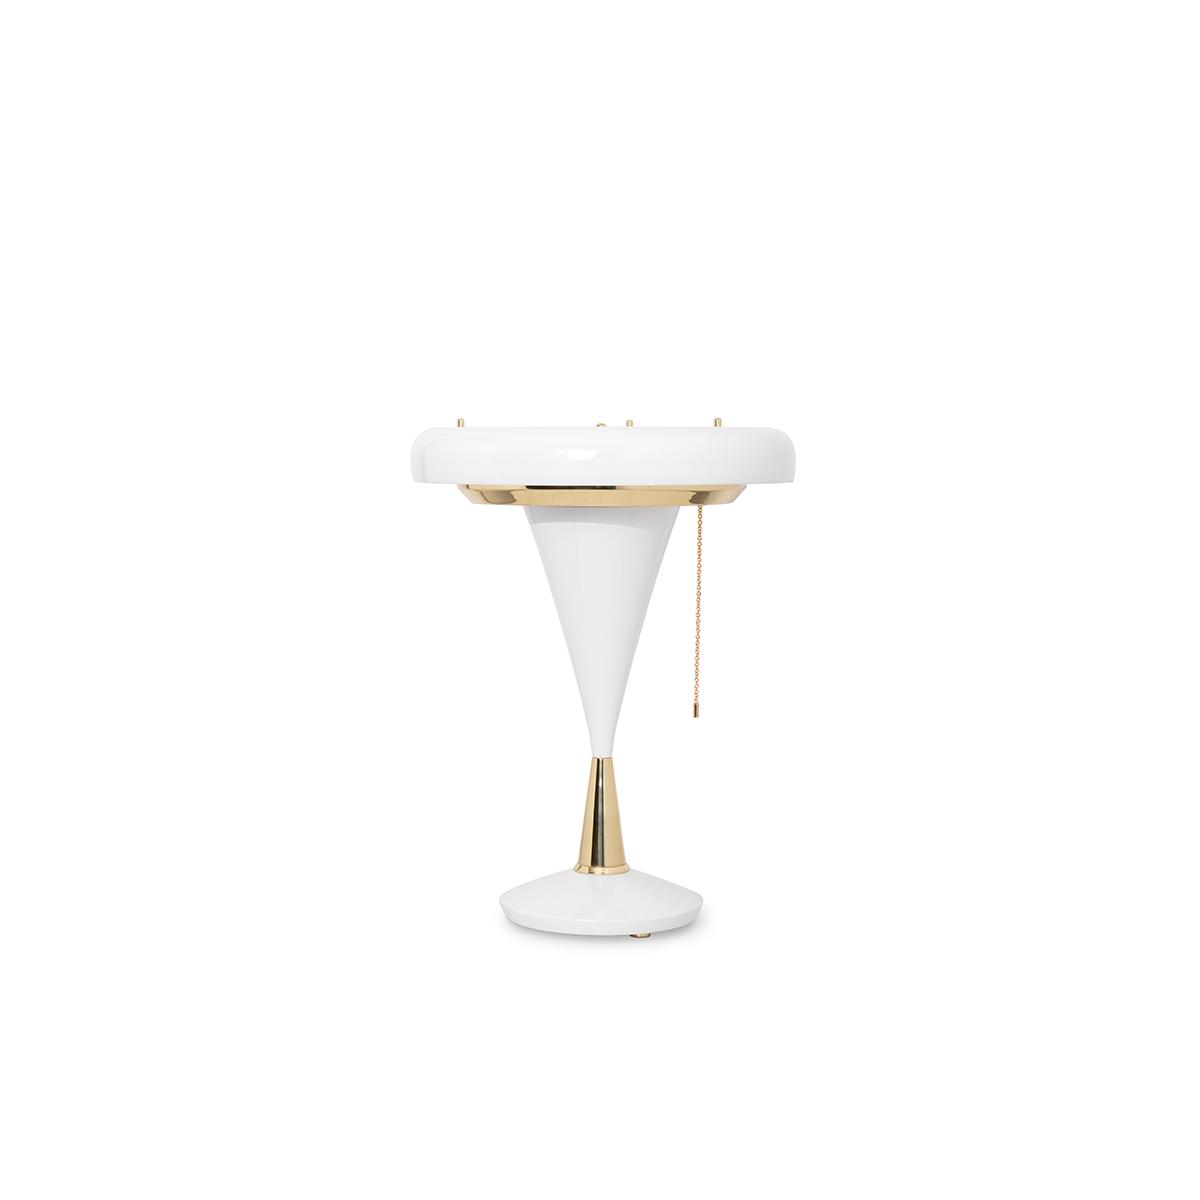 Carter Table Lamp Delightfull Covet House Curated Design regarding measurements 1200 X 1200